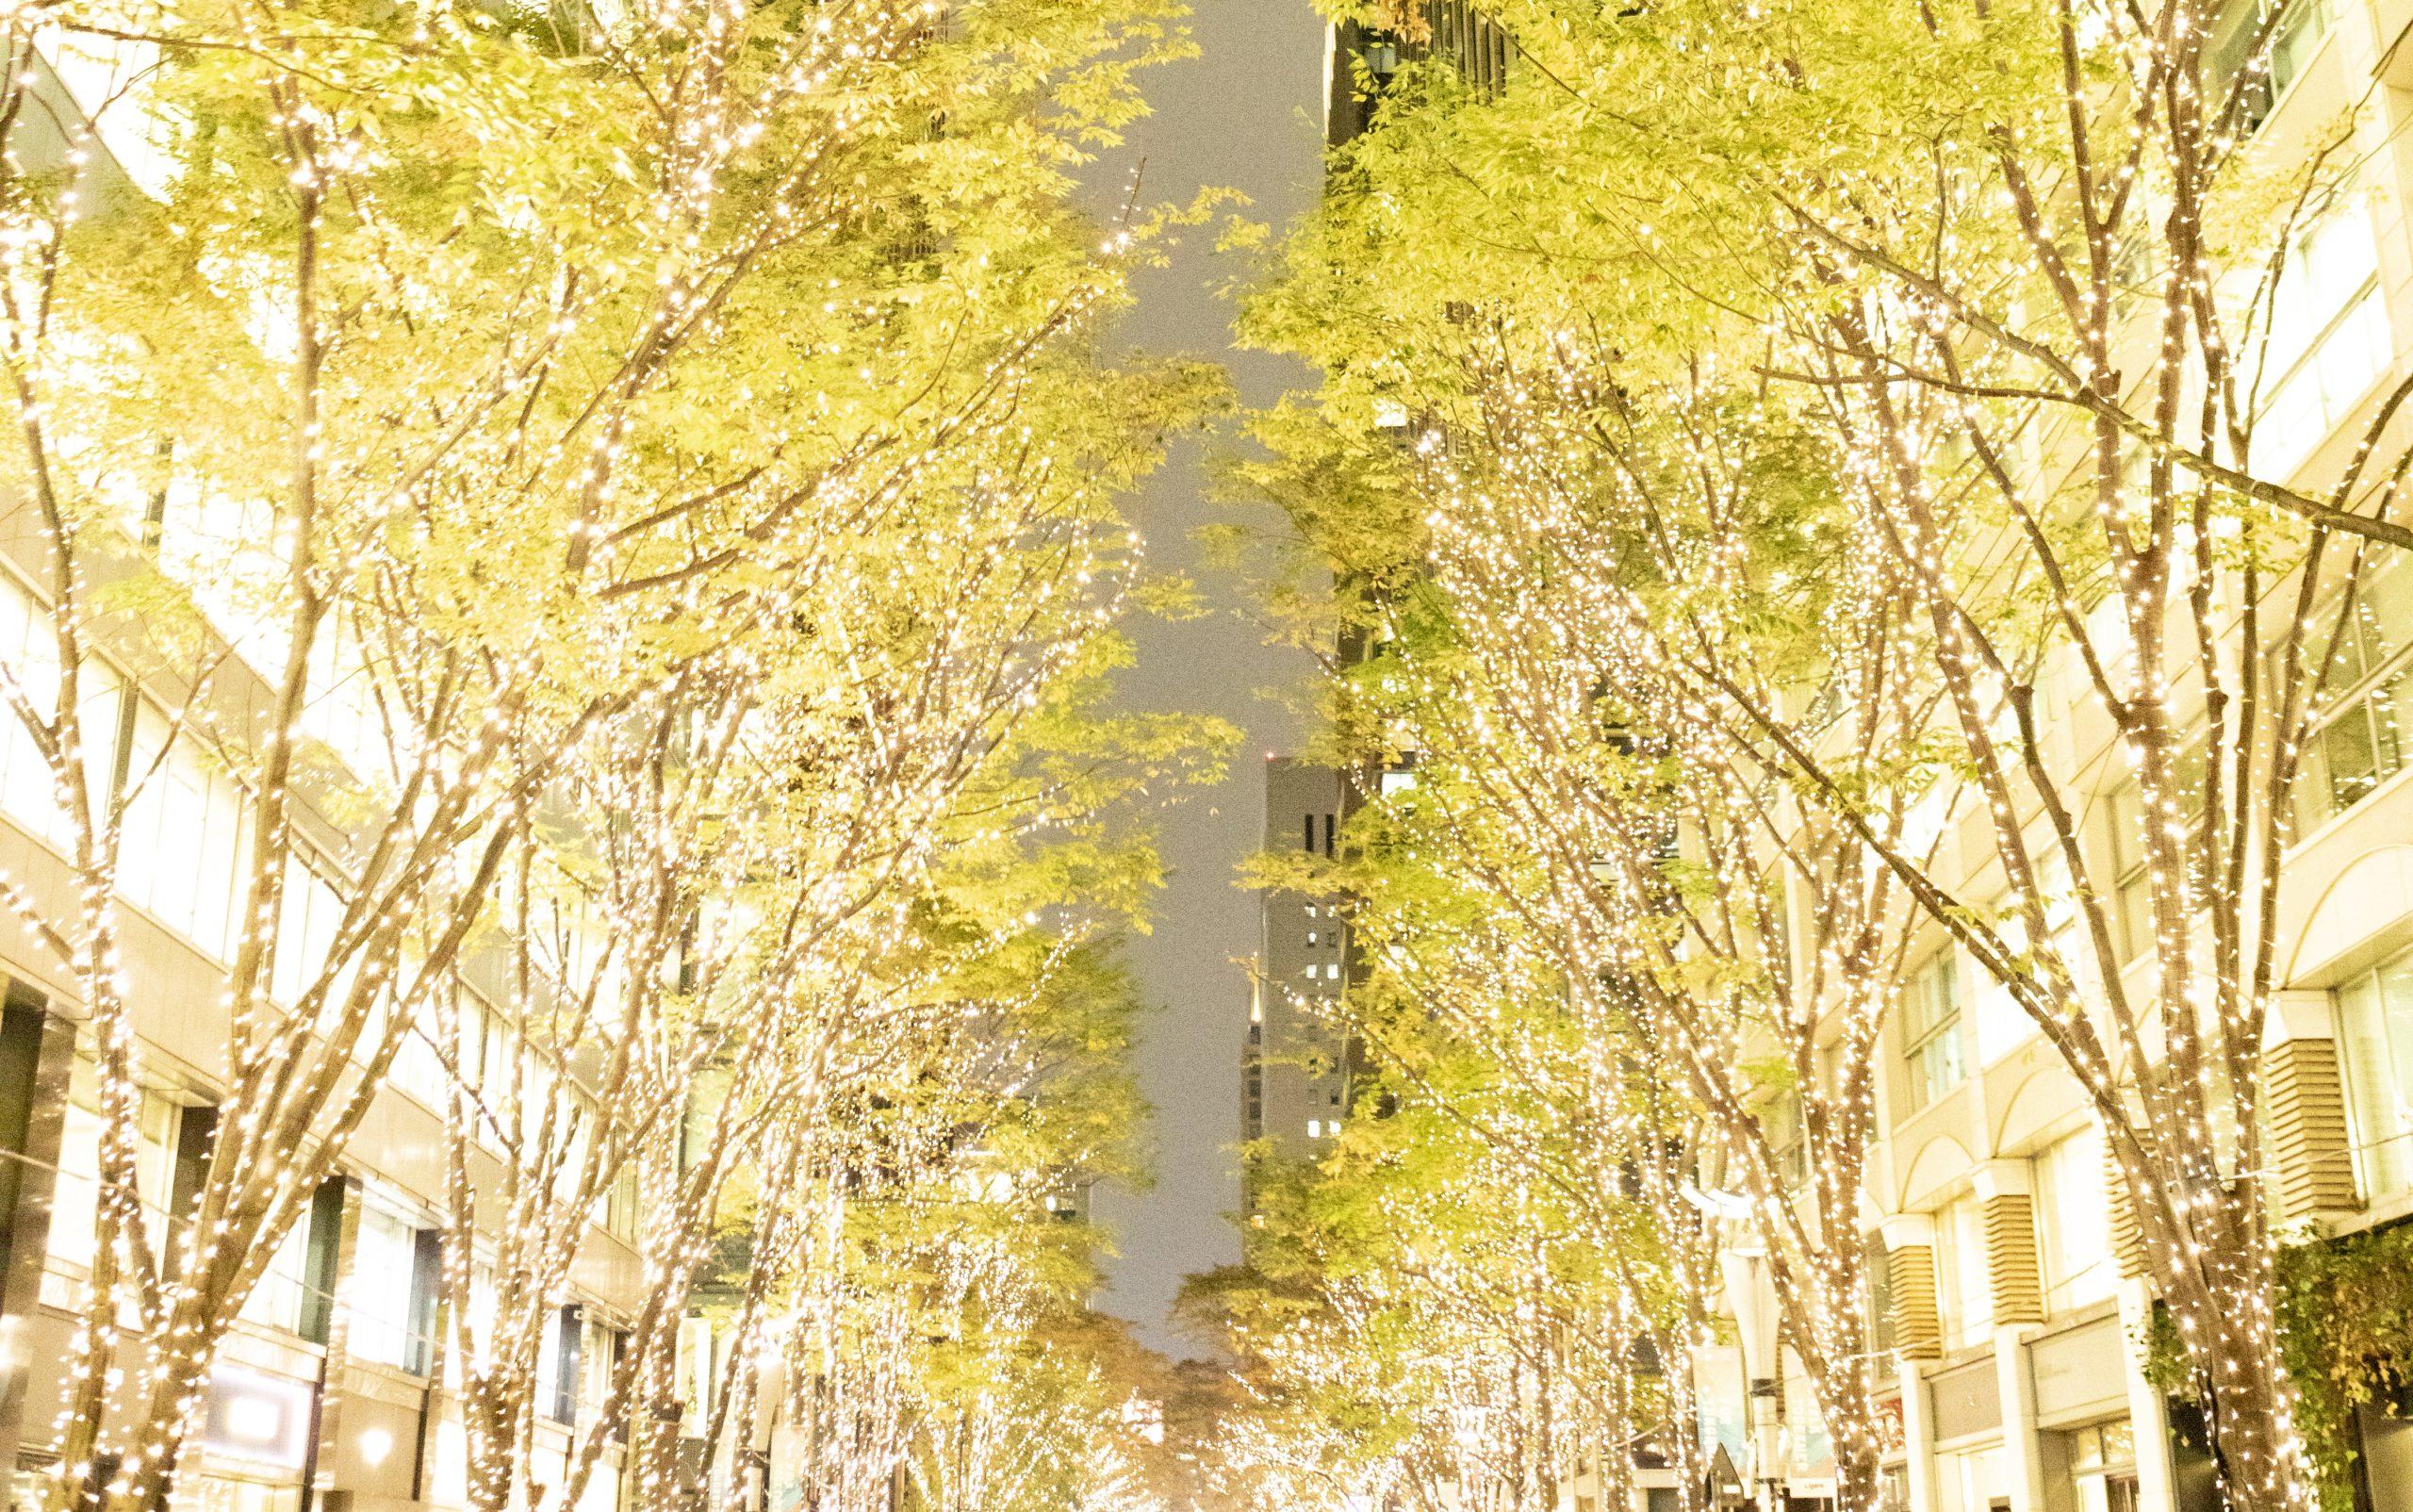 Marunouchi Happ.stand&gallery 12月1日(火)〜12月25日(金)Discover Marunouchi Special Christmas with Marunouchi Happ.を開催!